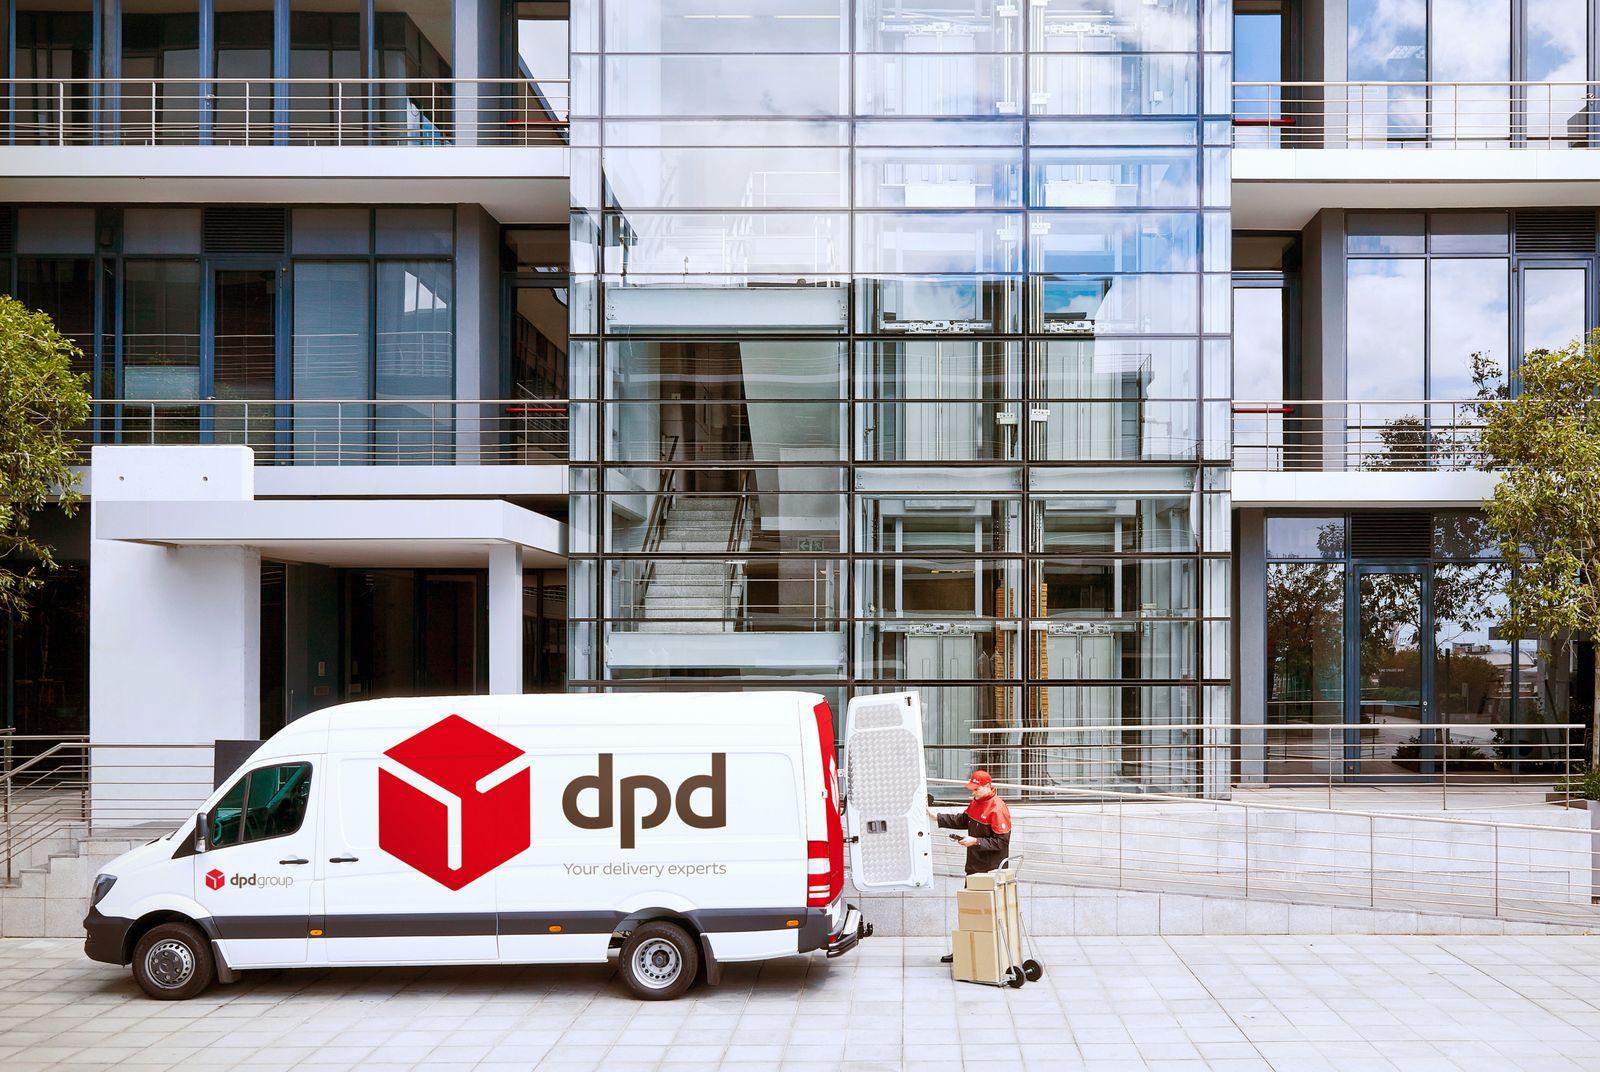 DPD / Neues Logo